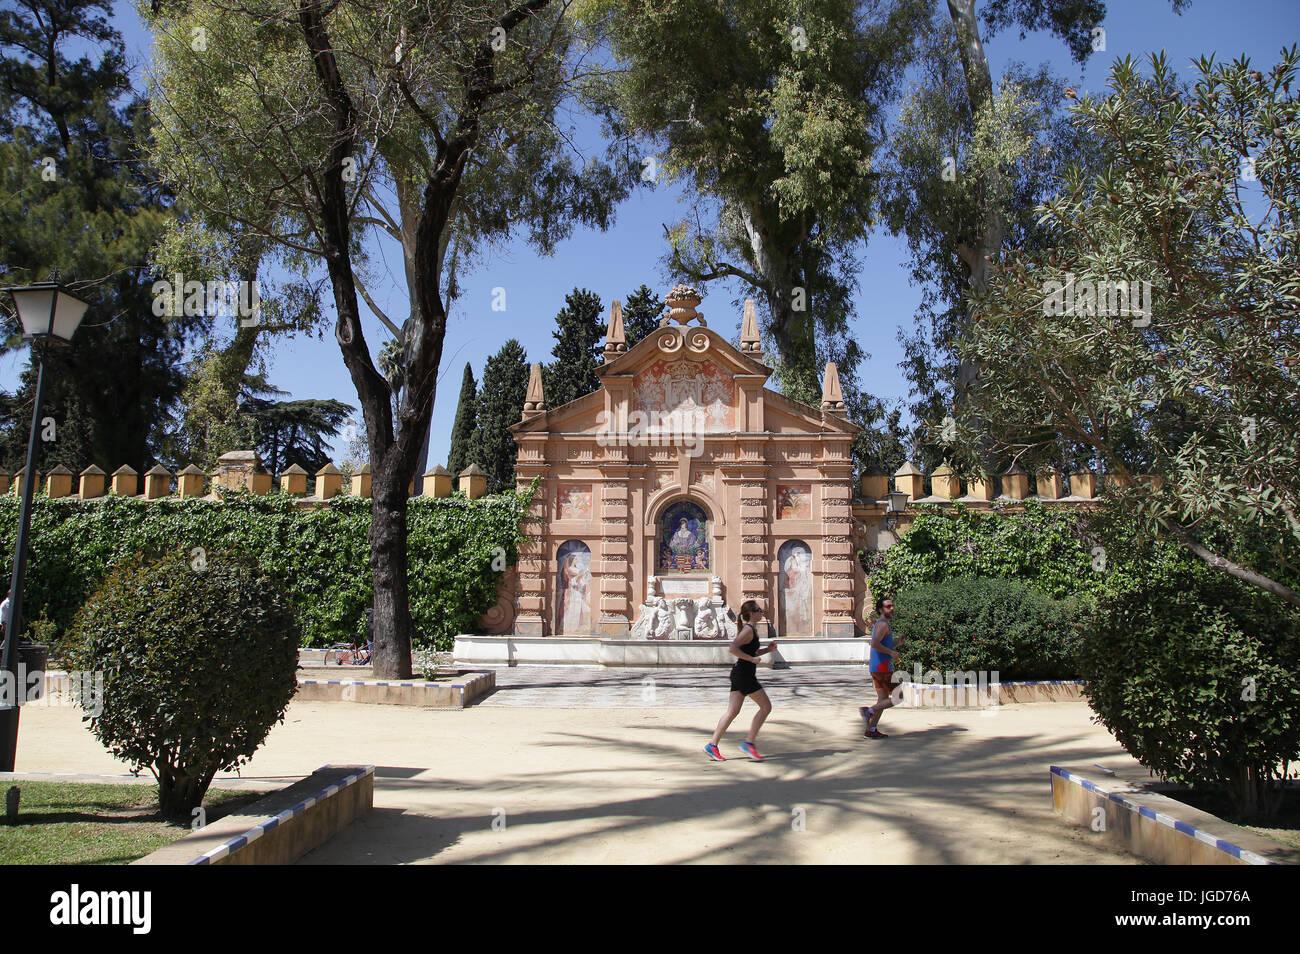 Joggers Monument Catalina de Ribera in the Jardines de Murillo Gardens Seville Spain - Stock Image